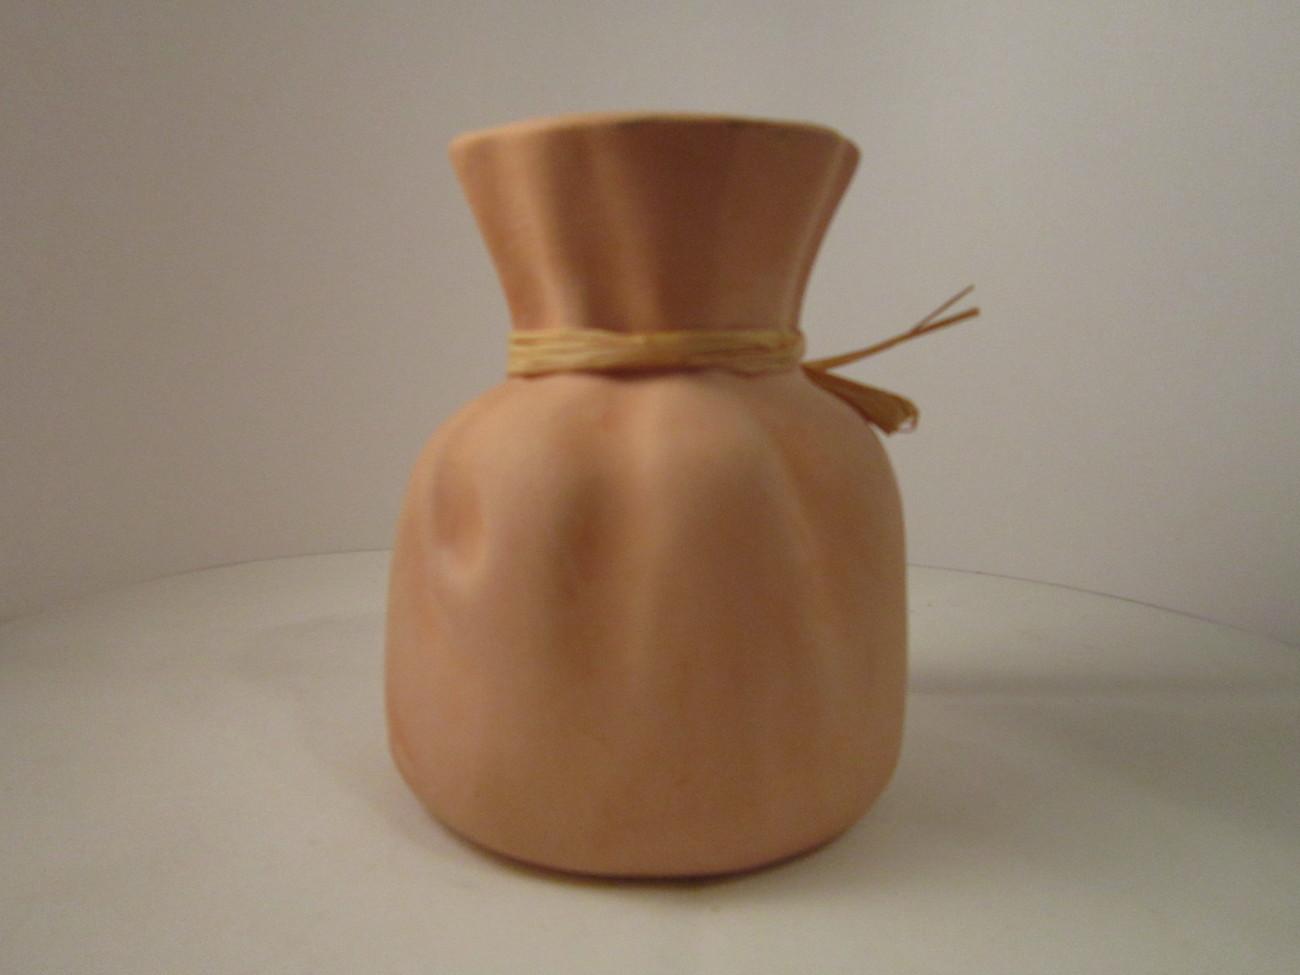 Small Sack Vase Country Kitchen Terra Cotta Pottery, Glazed inside